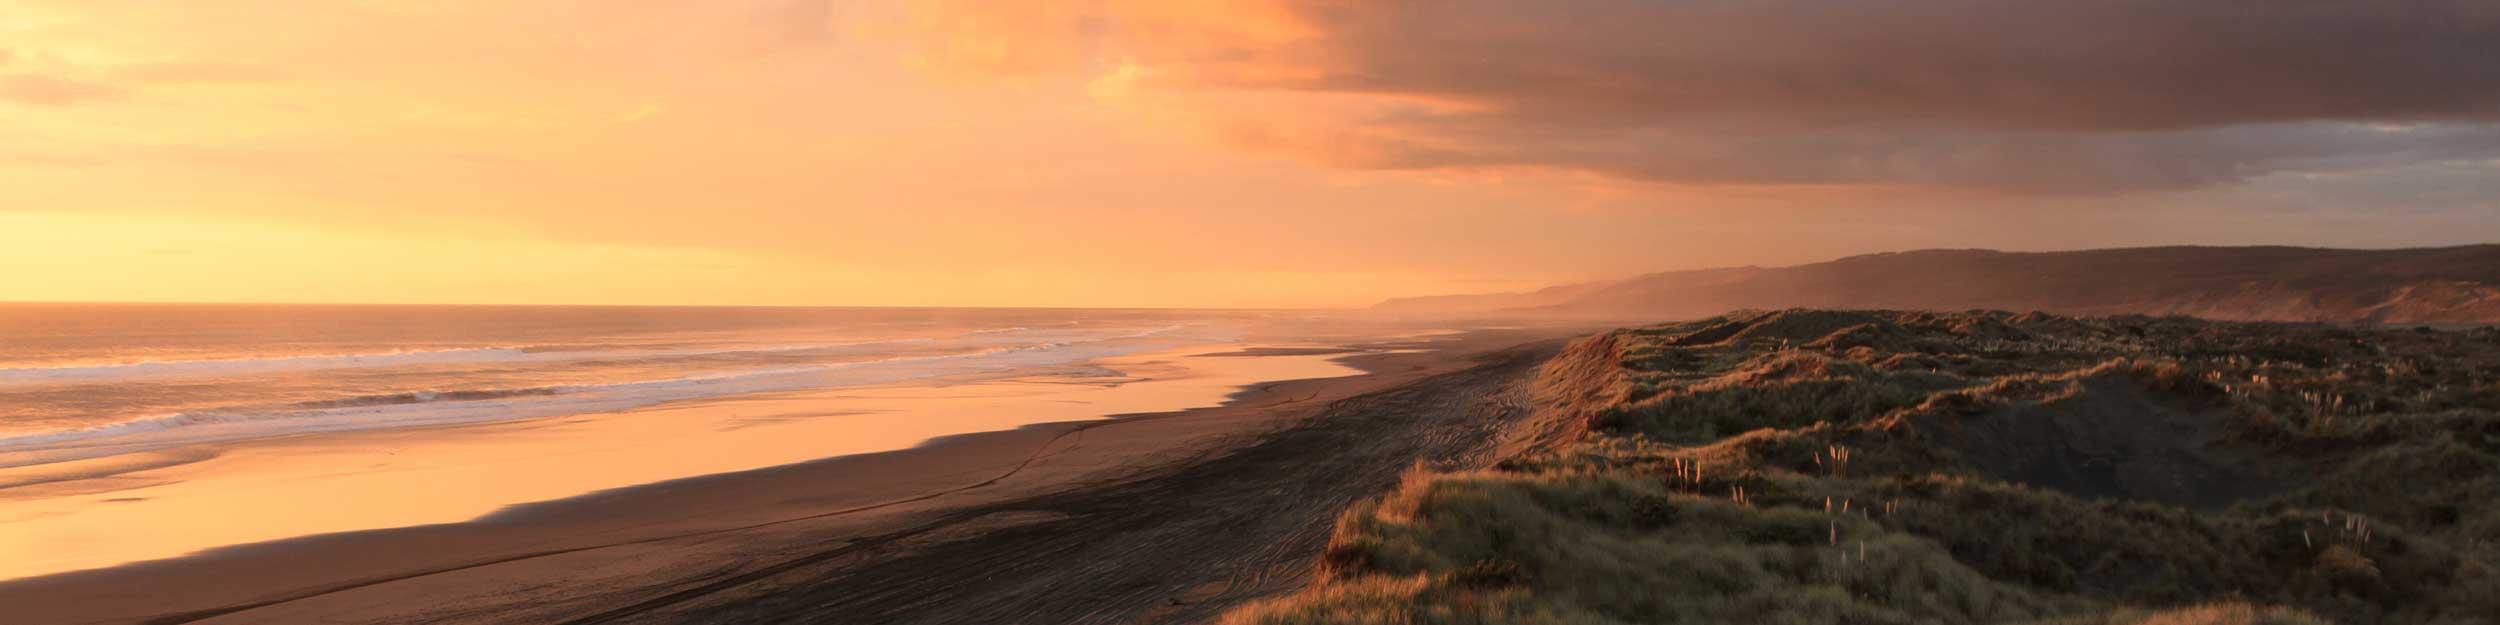 sunset-beach-full-wdth-web